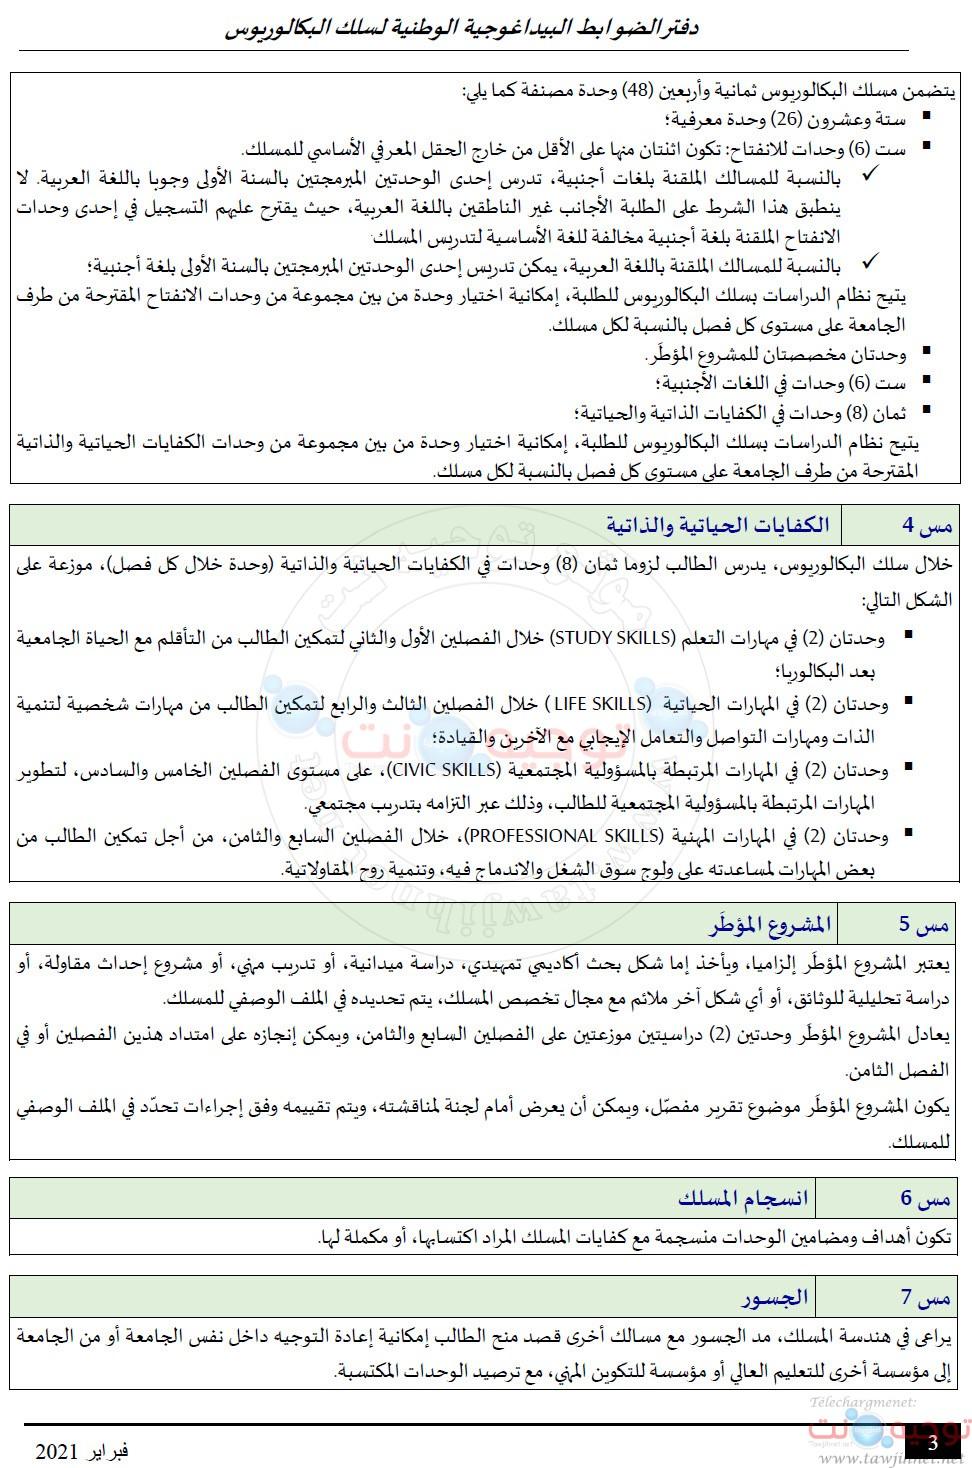 Bachelor-CNPN-normes-pedagoqiques-2021_Page_03.jpg